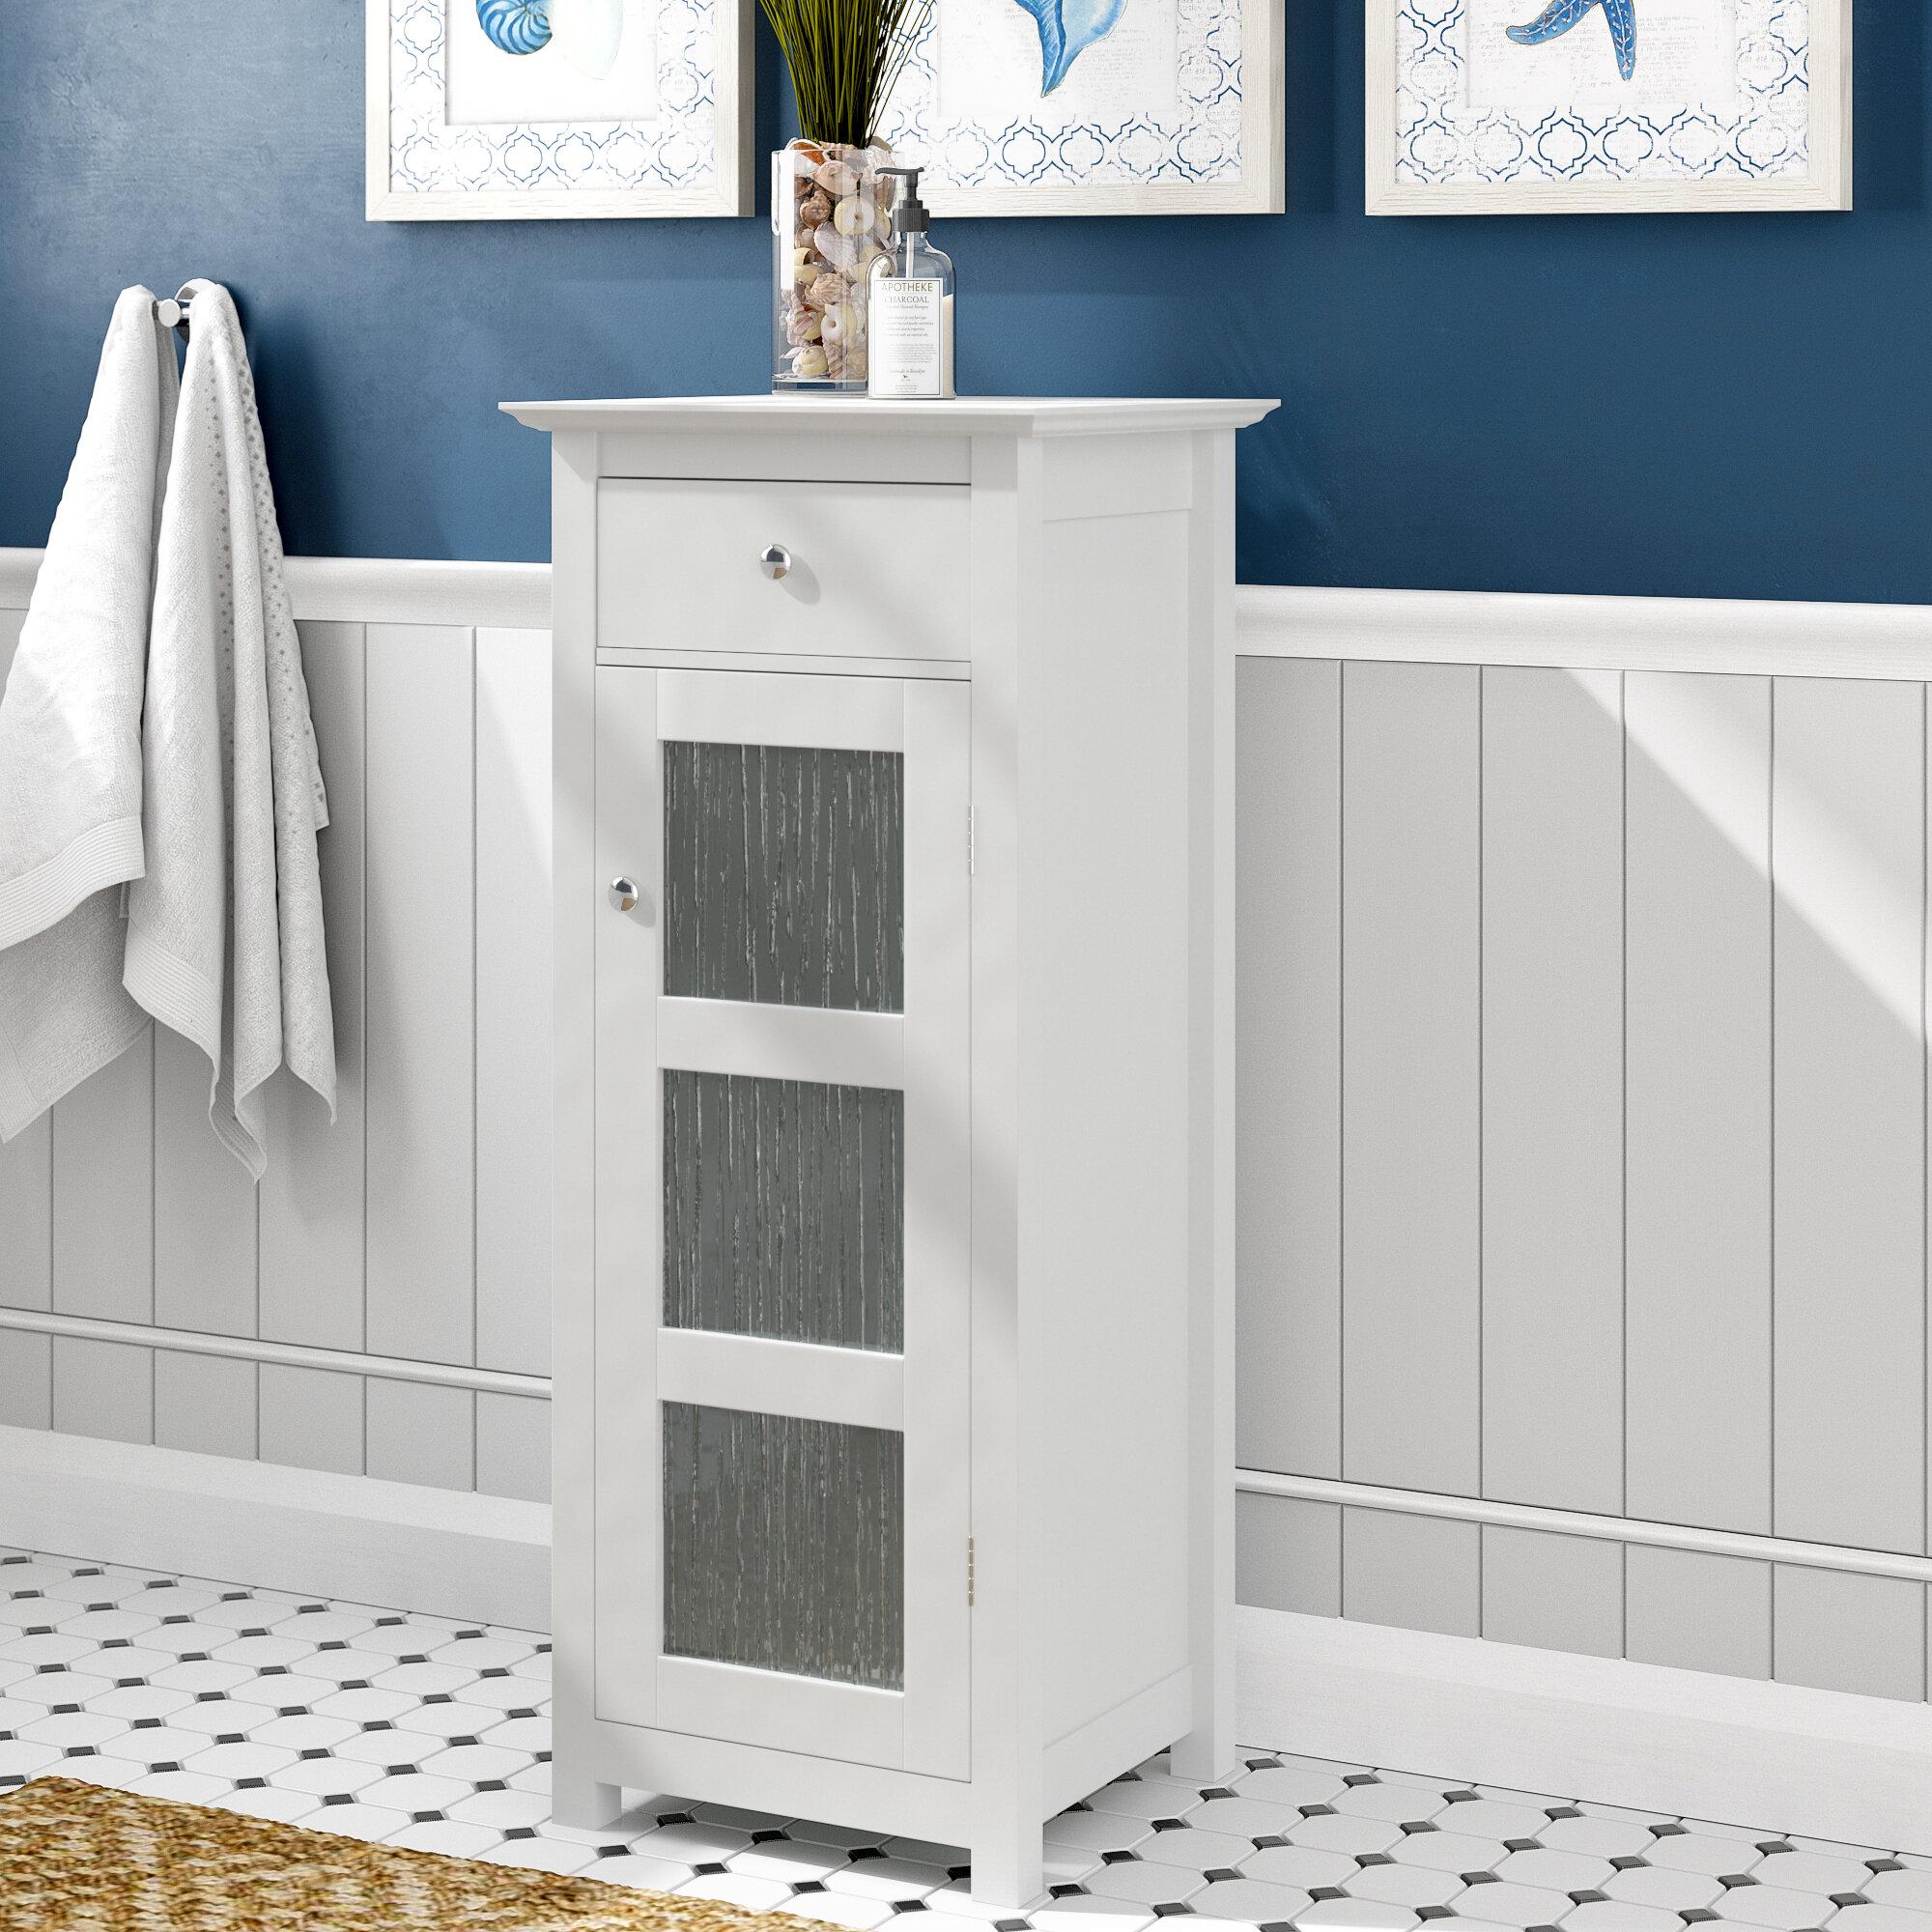 Freestanding Bathroom Cabinets  Wayfair